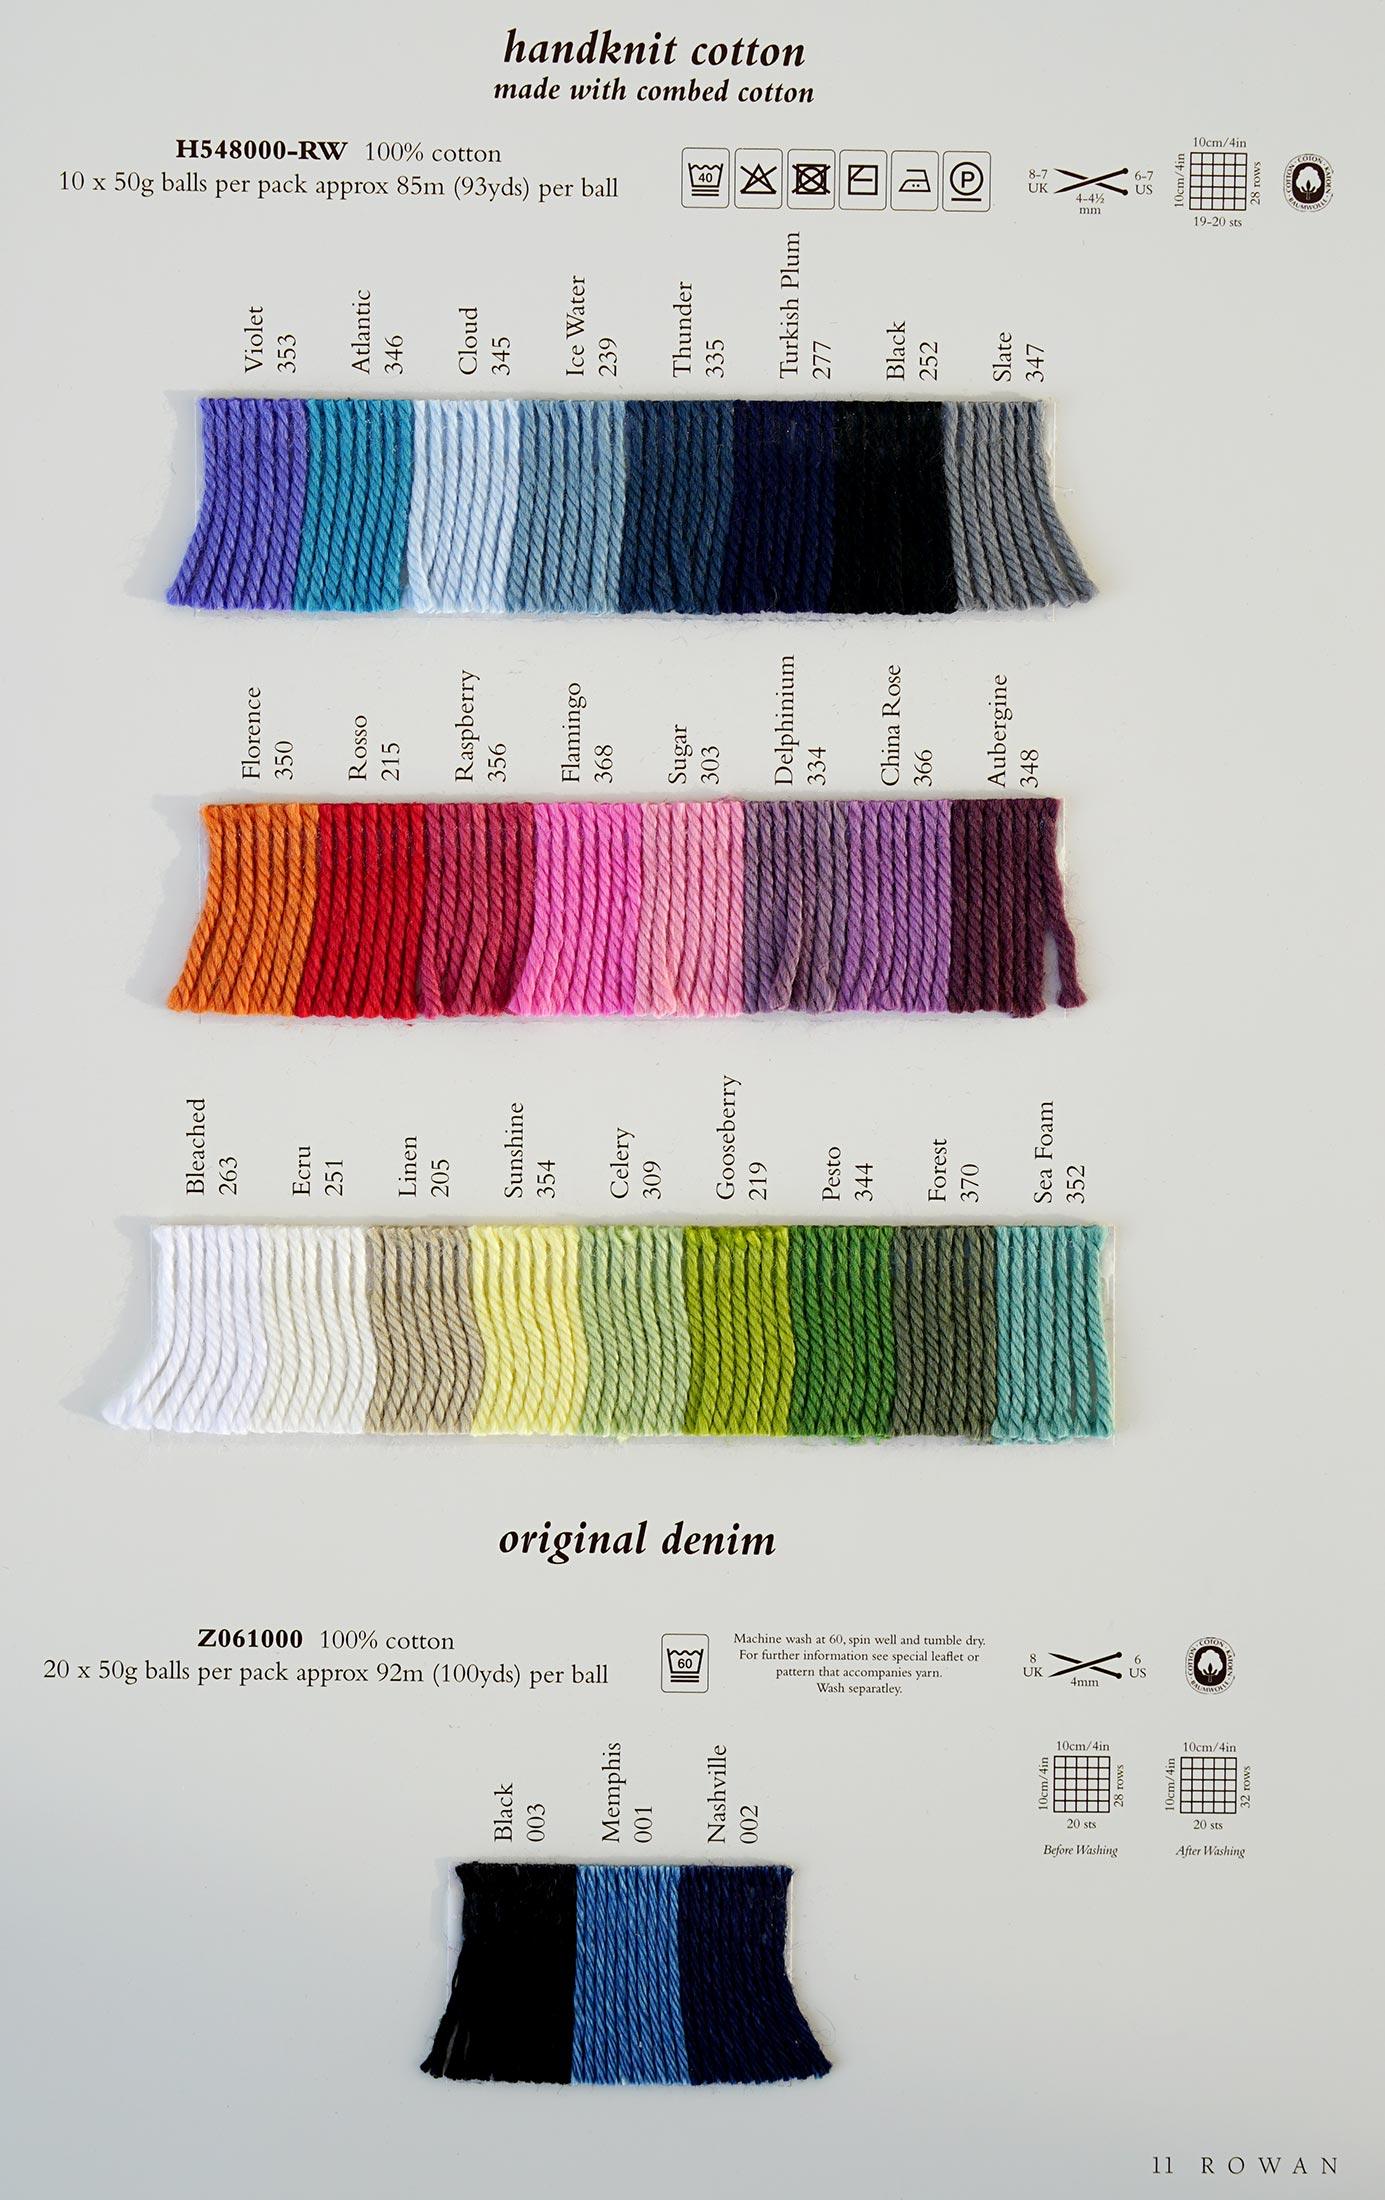 Knitting Patterns Rowan Wool Cotton : Rowan Handknit DK Cotton - Rowan Yarns RYC Sirdar Sublime English Yarns knitt...